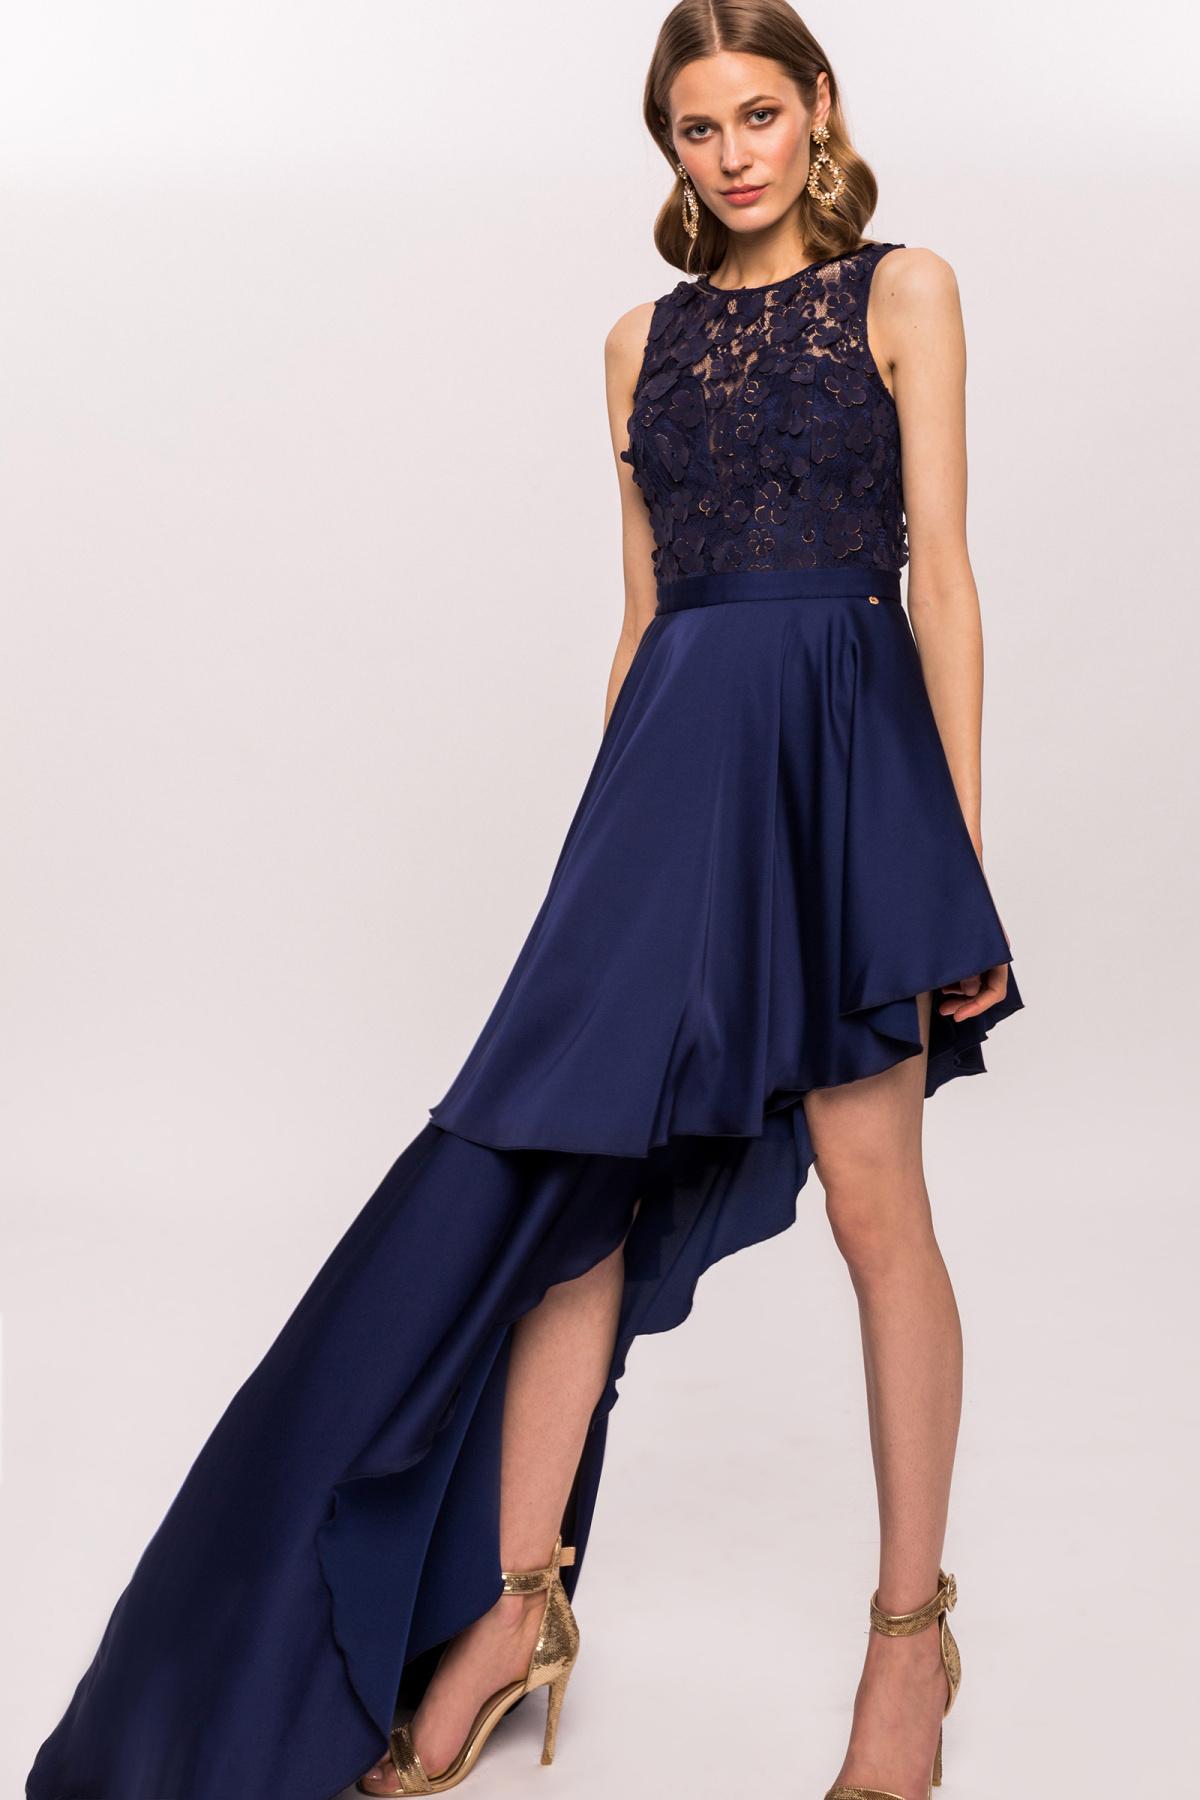 3d Floral Lase Asymmetrical Dress Rs9701 Nissa